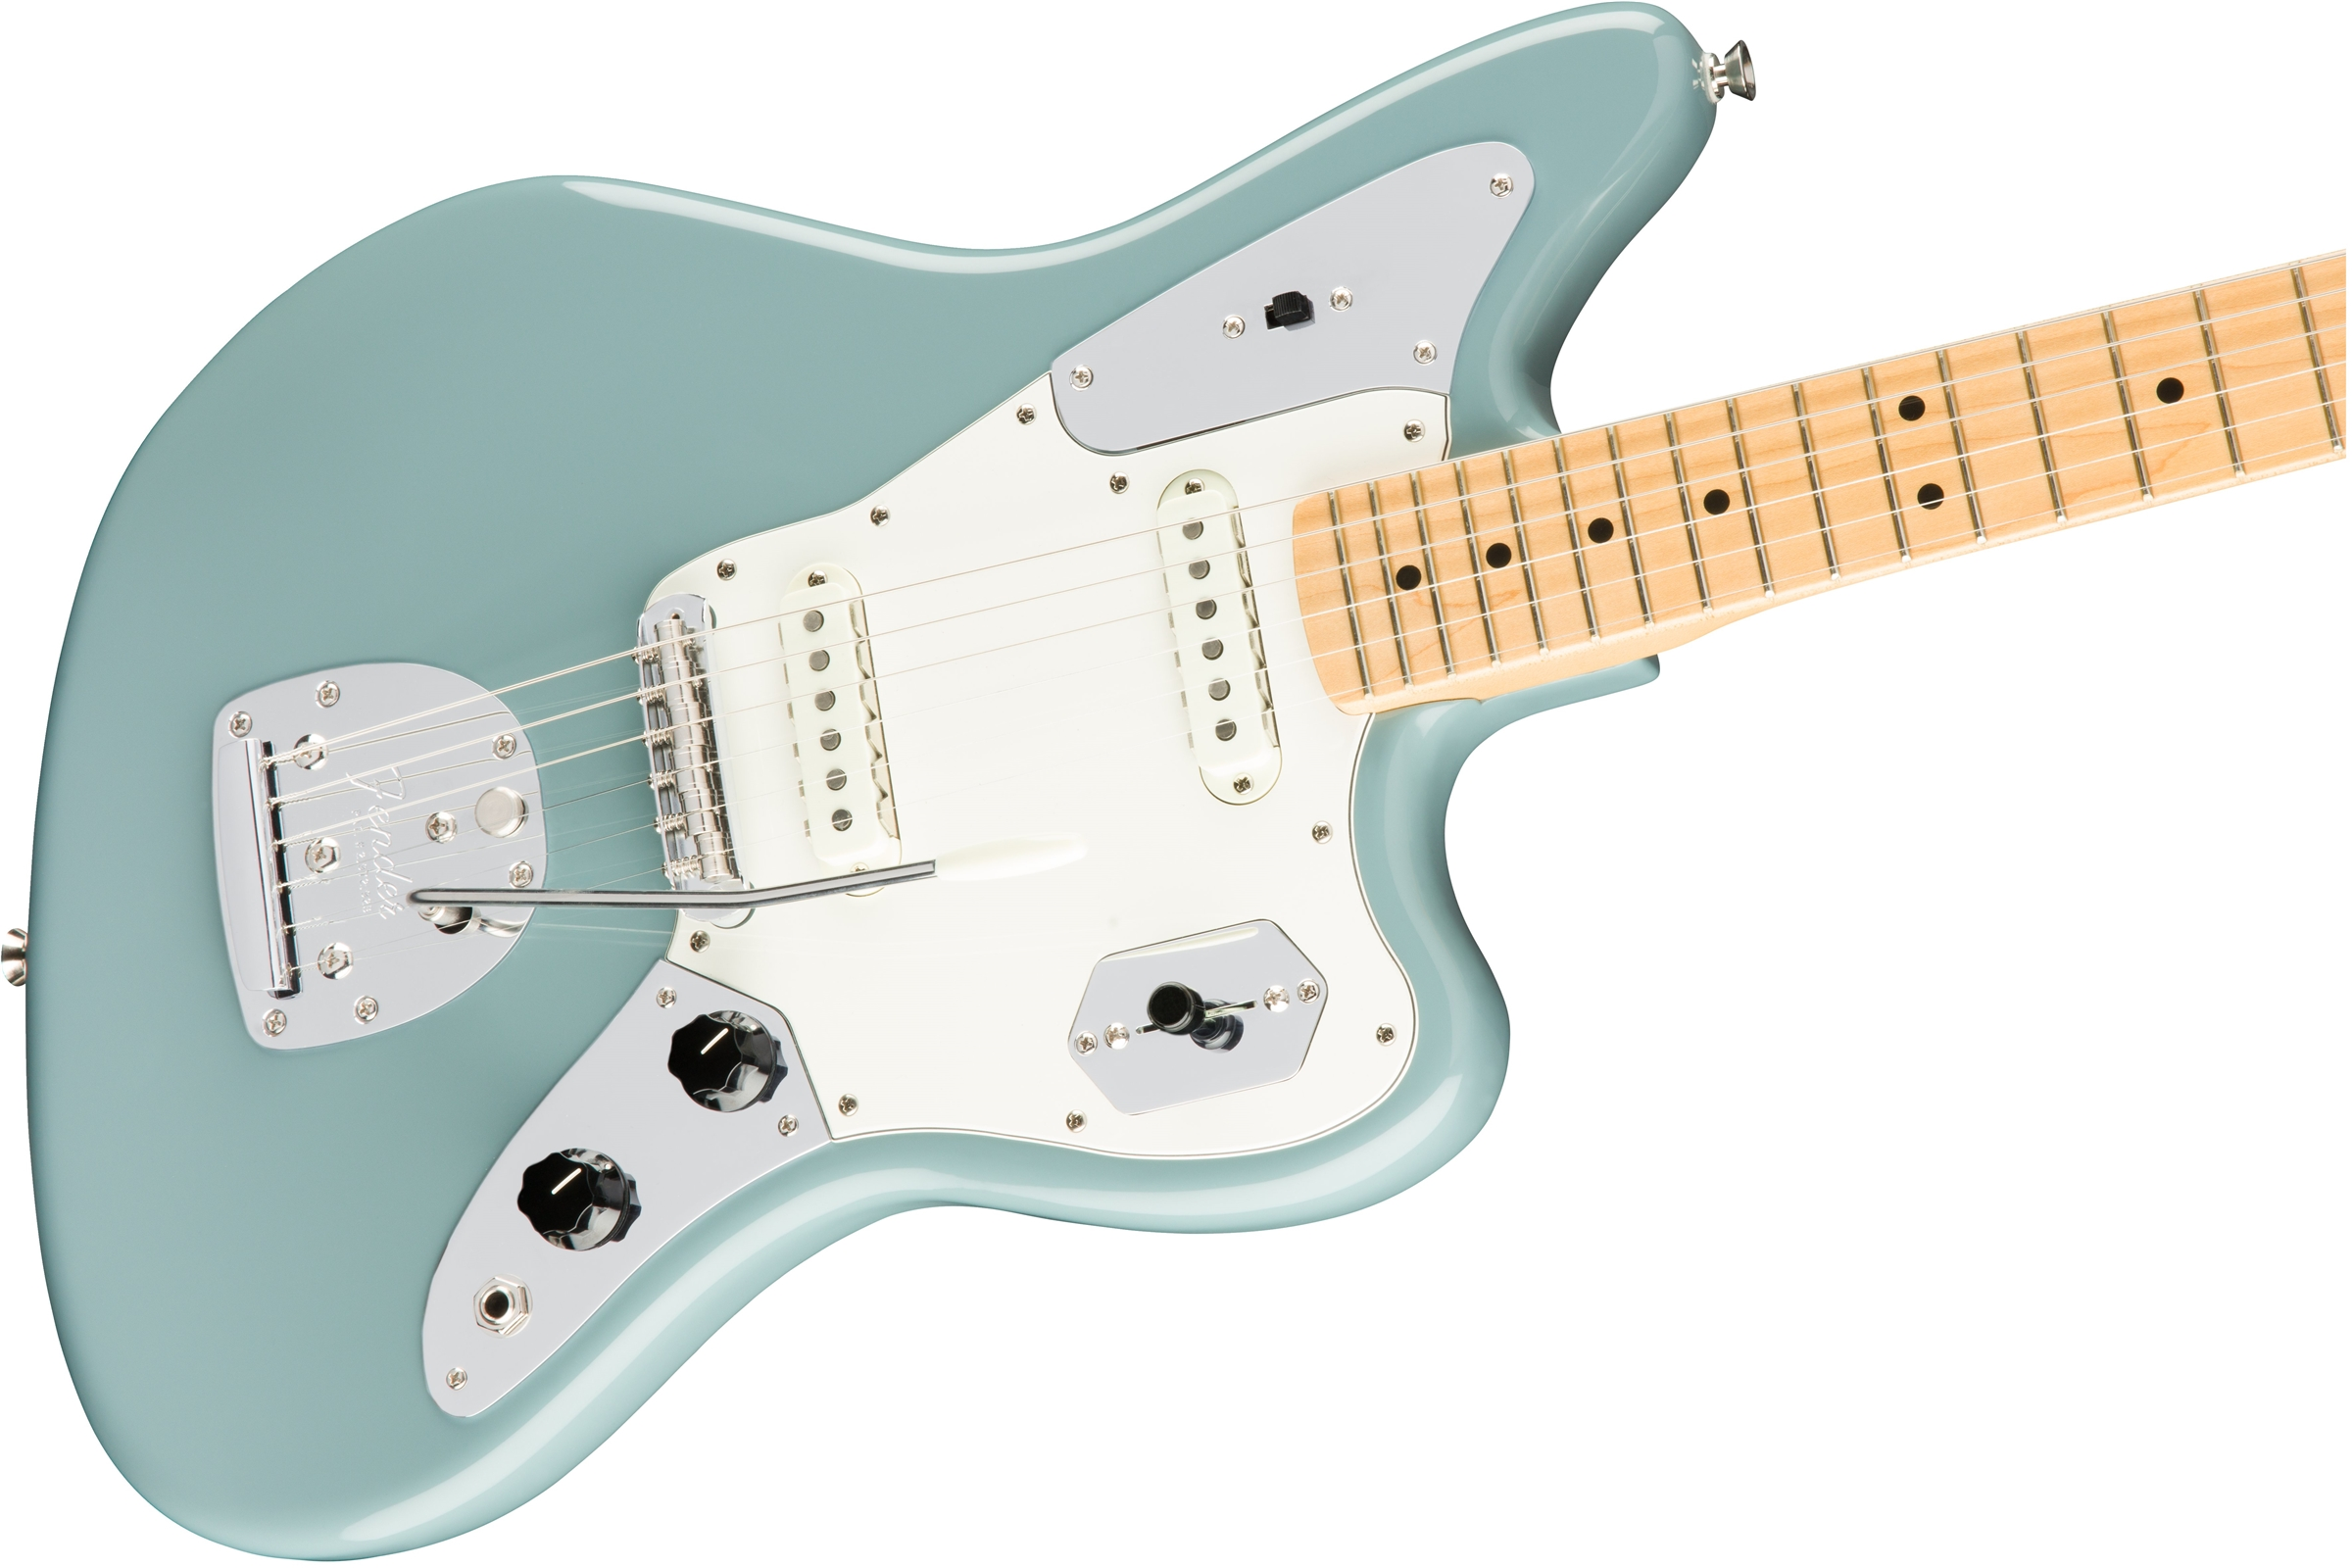 rosewood jaguar original color sunburst guitar products american img edit fender electric fingerboard